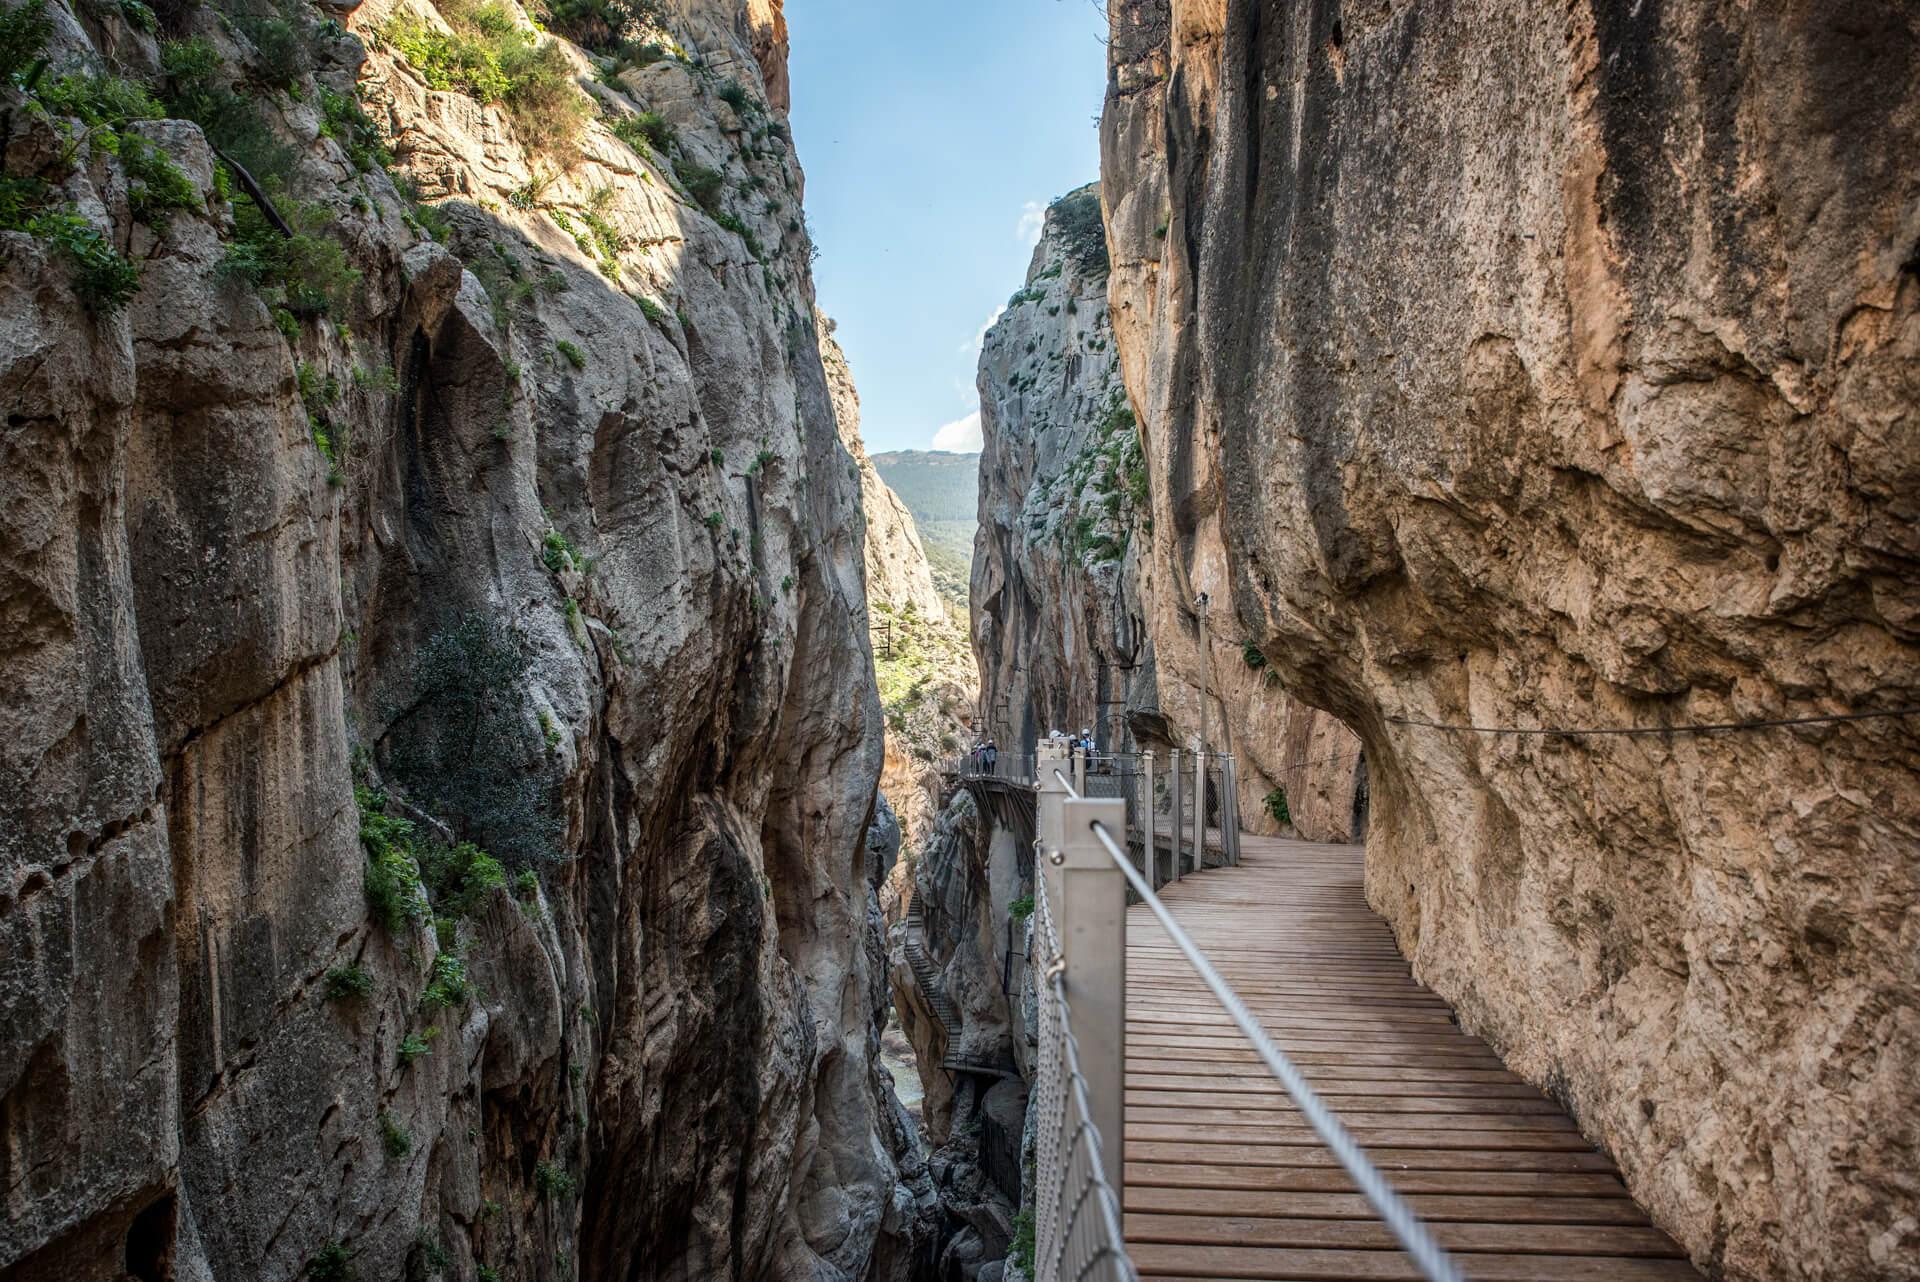 Andaluzja, Malaga, Caminito del Rey